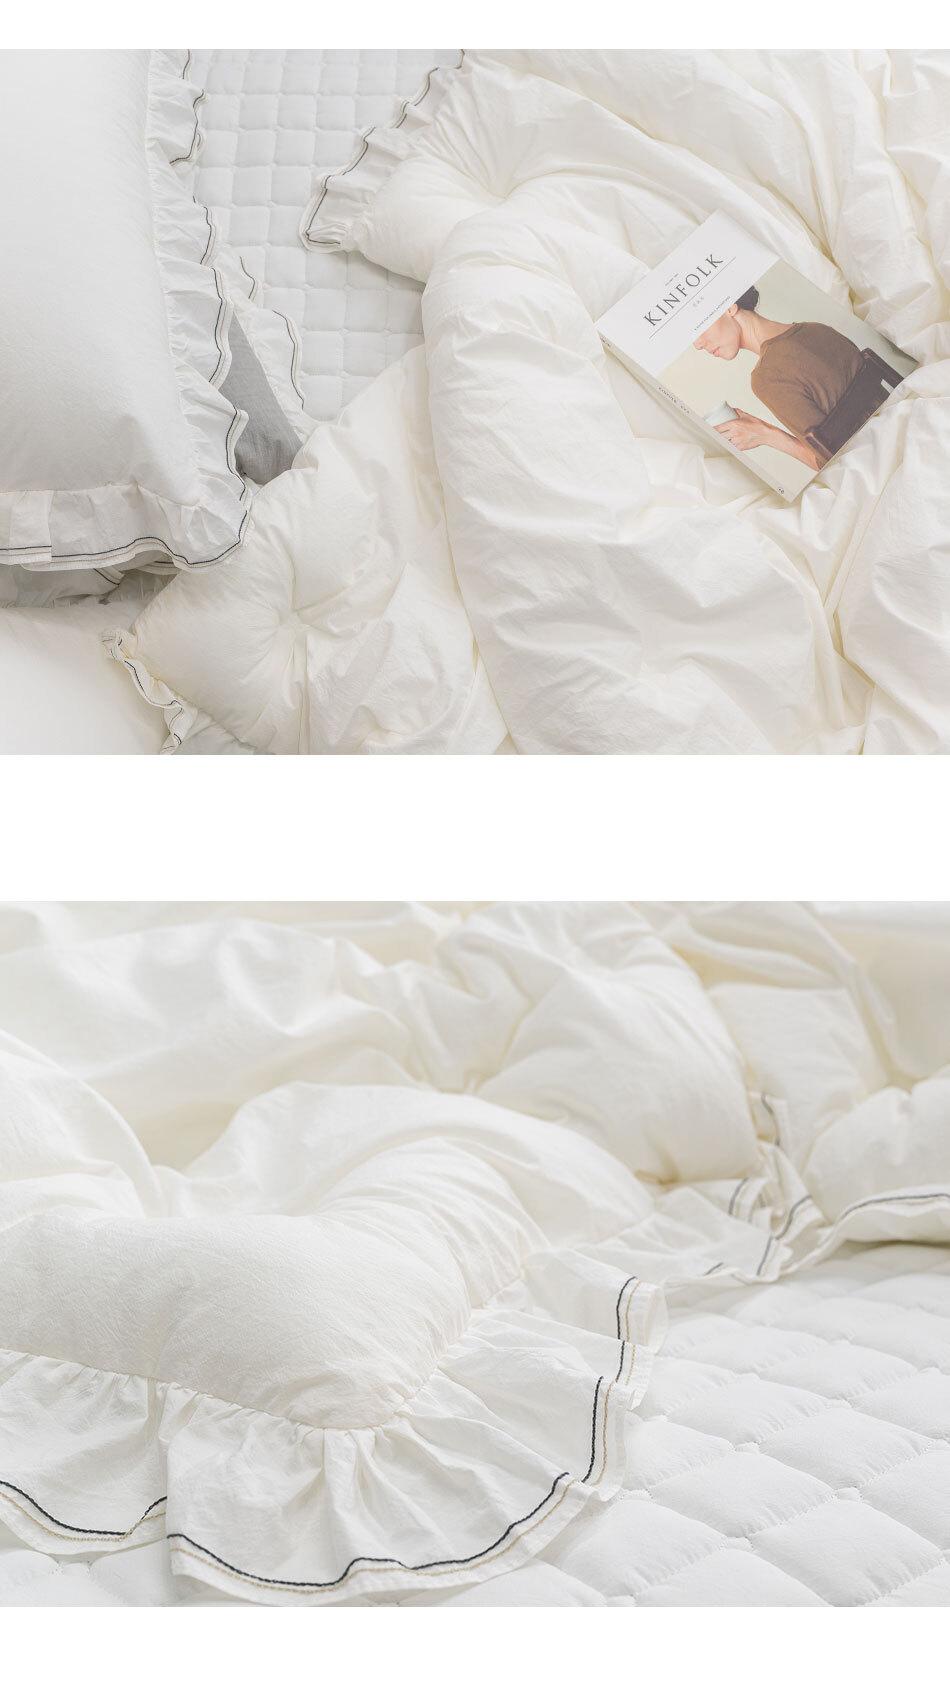 stay_bed_white3.jpg